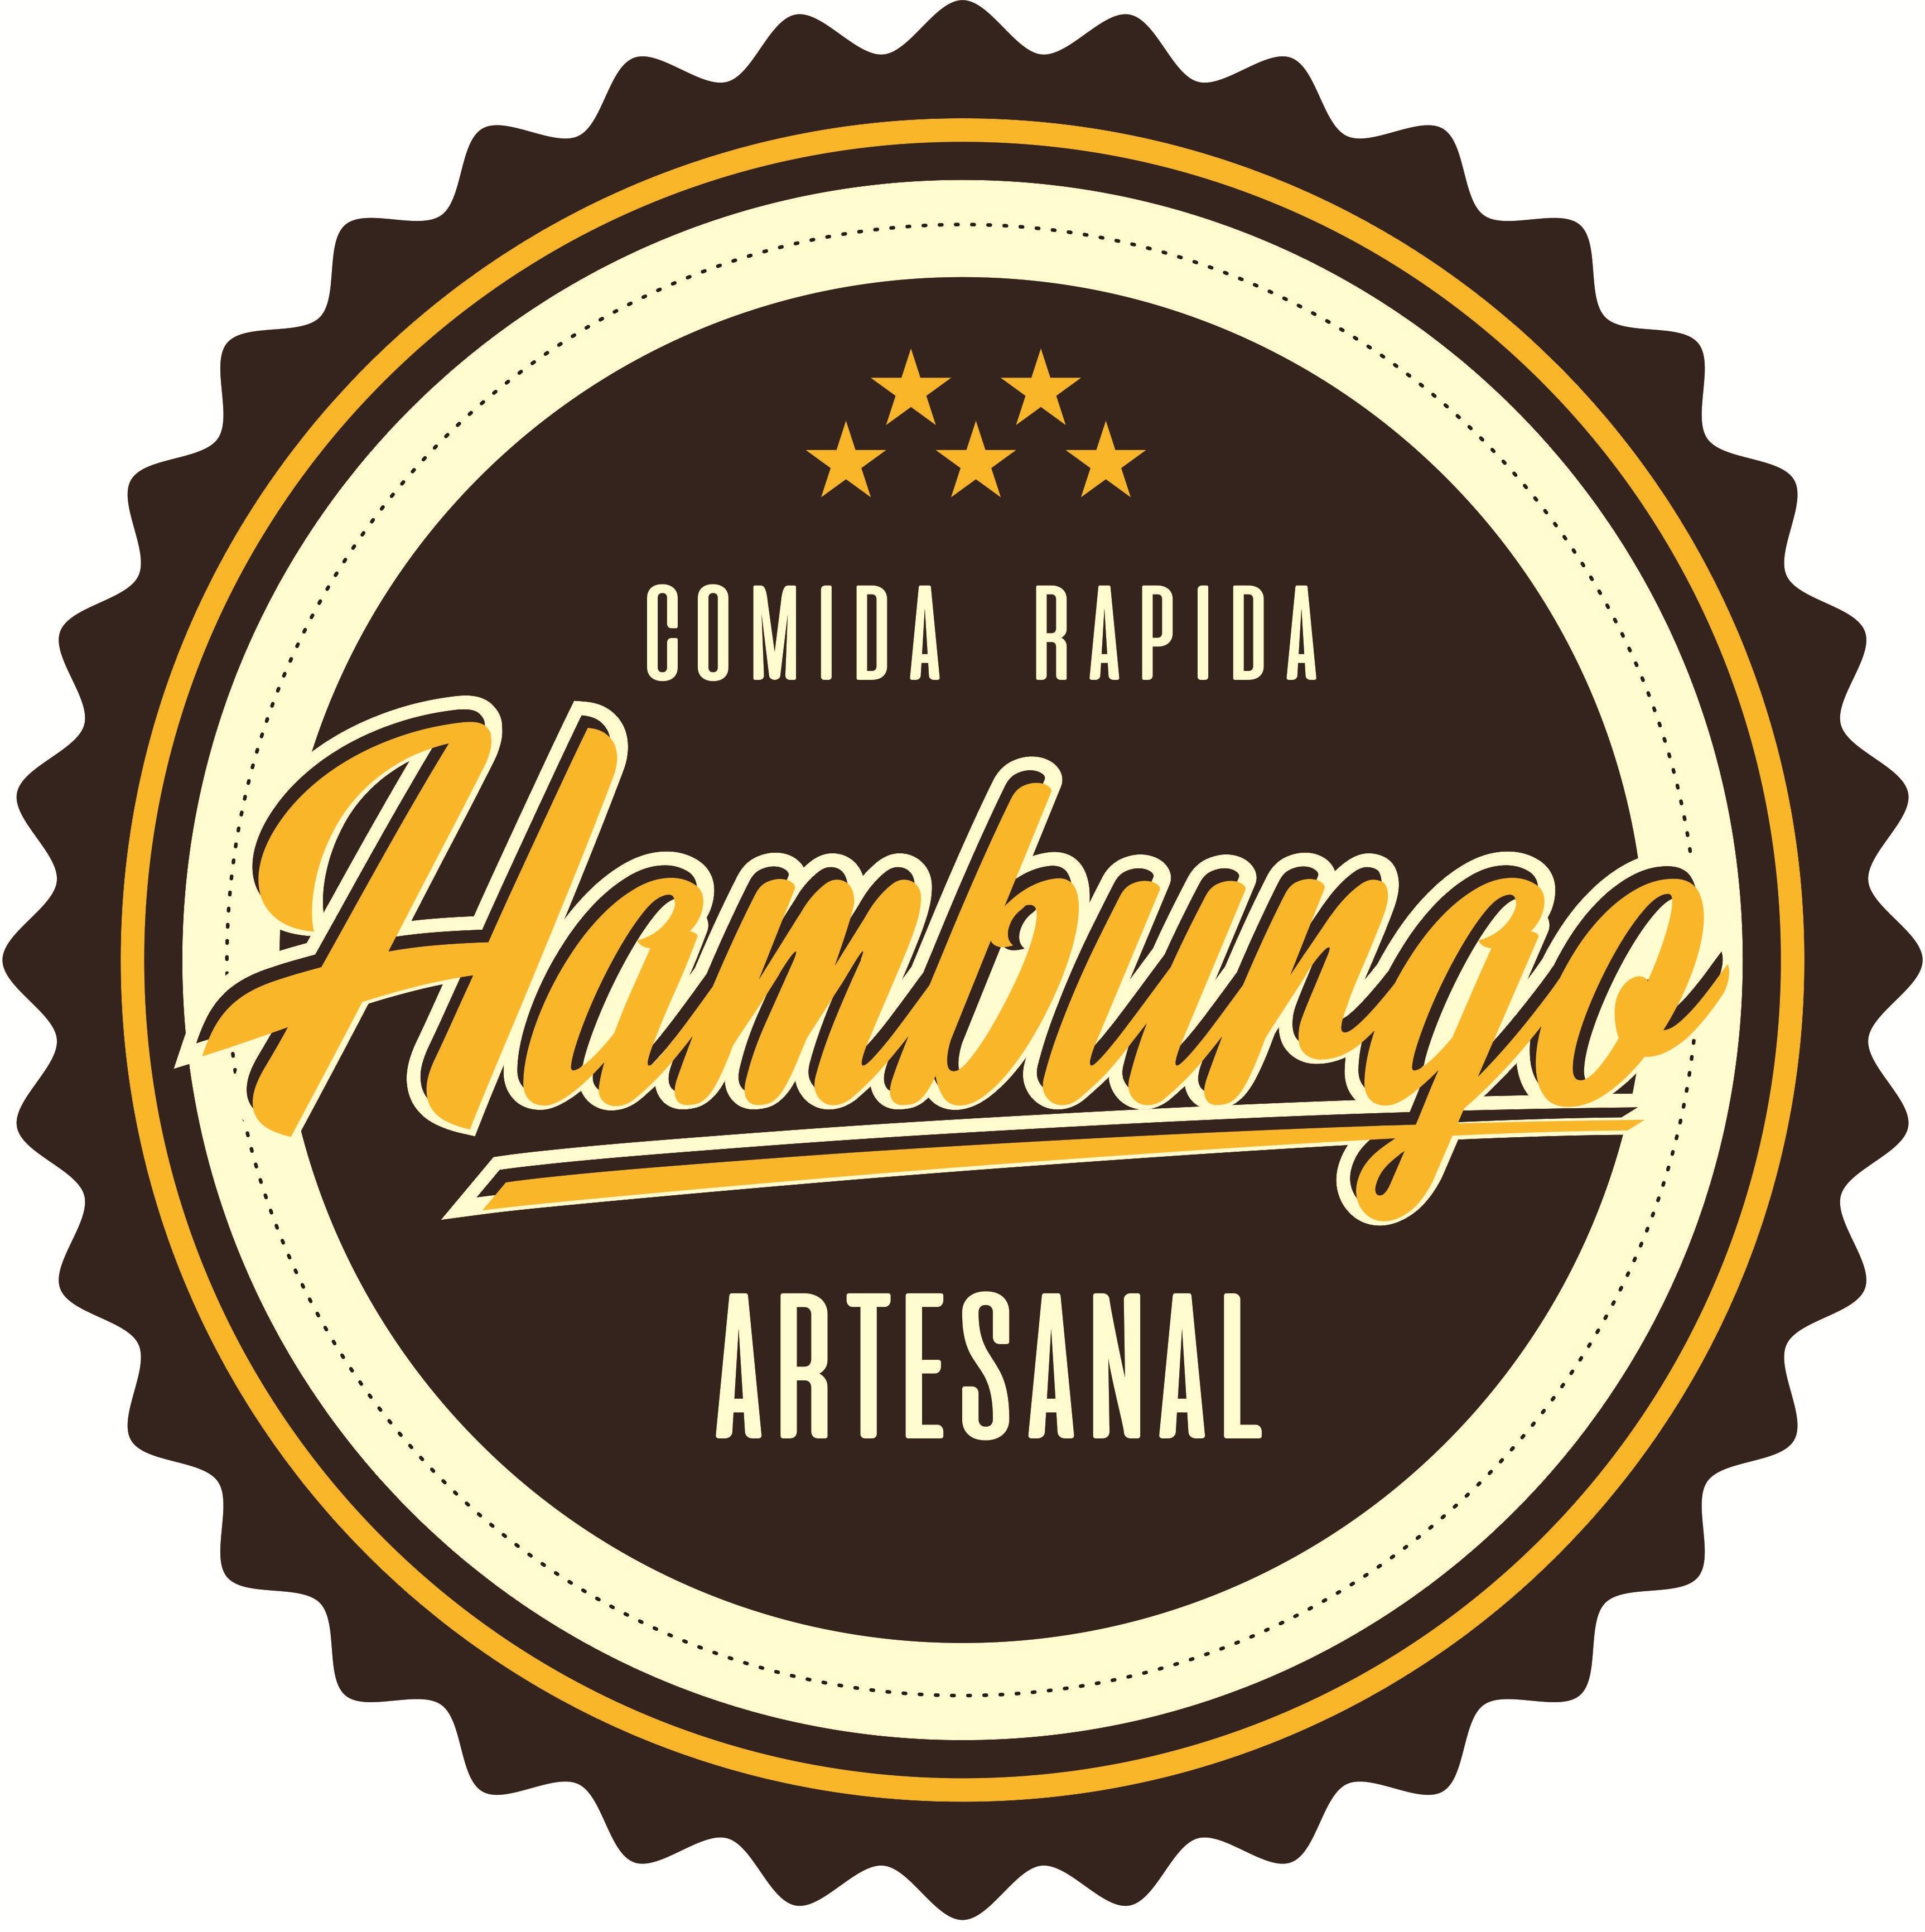 Hamburgo - Comida Rápida Artesanal